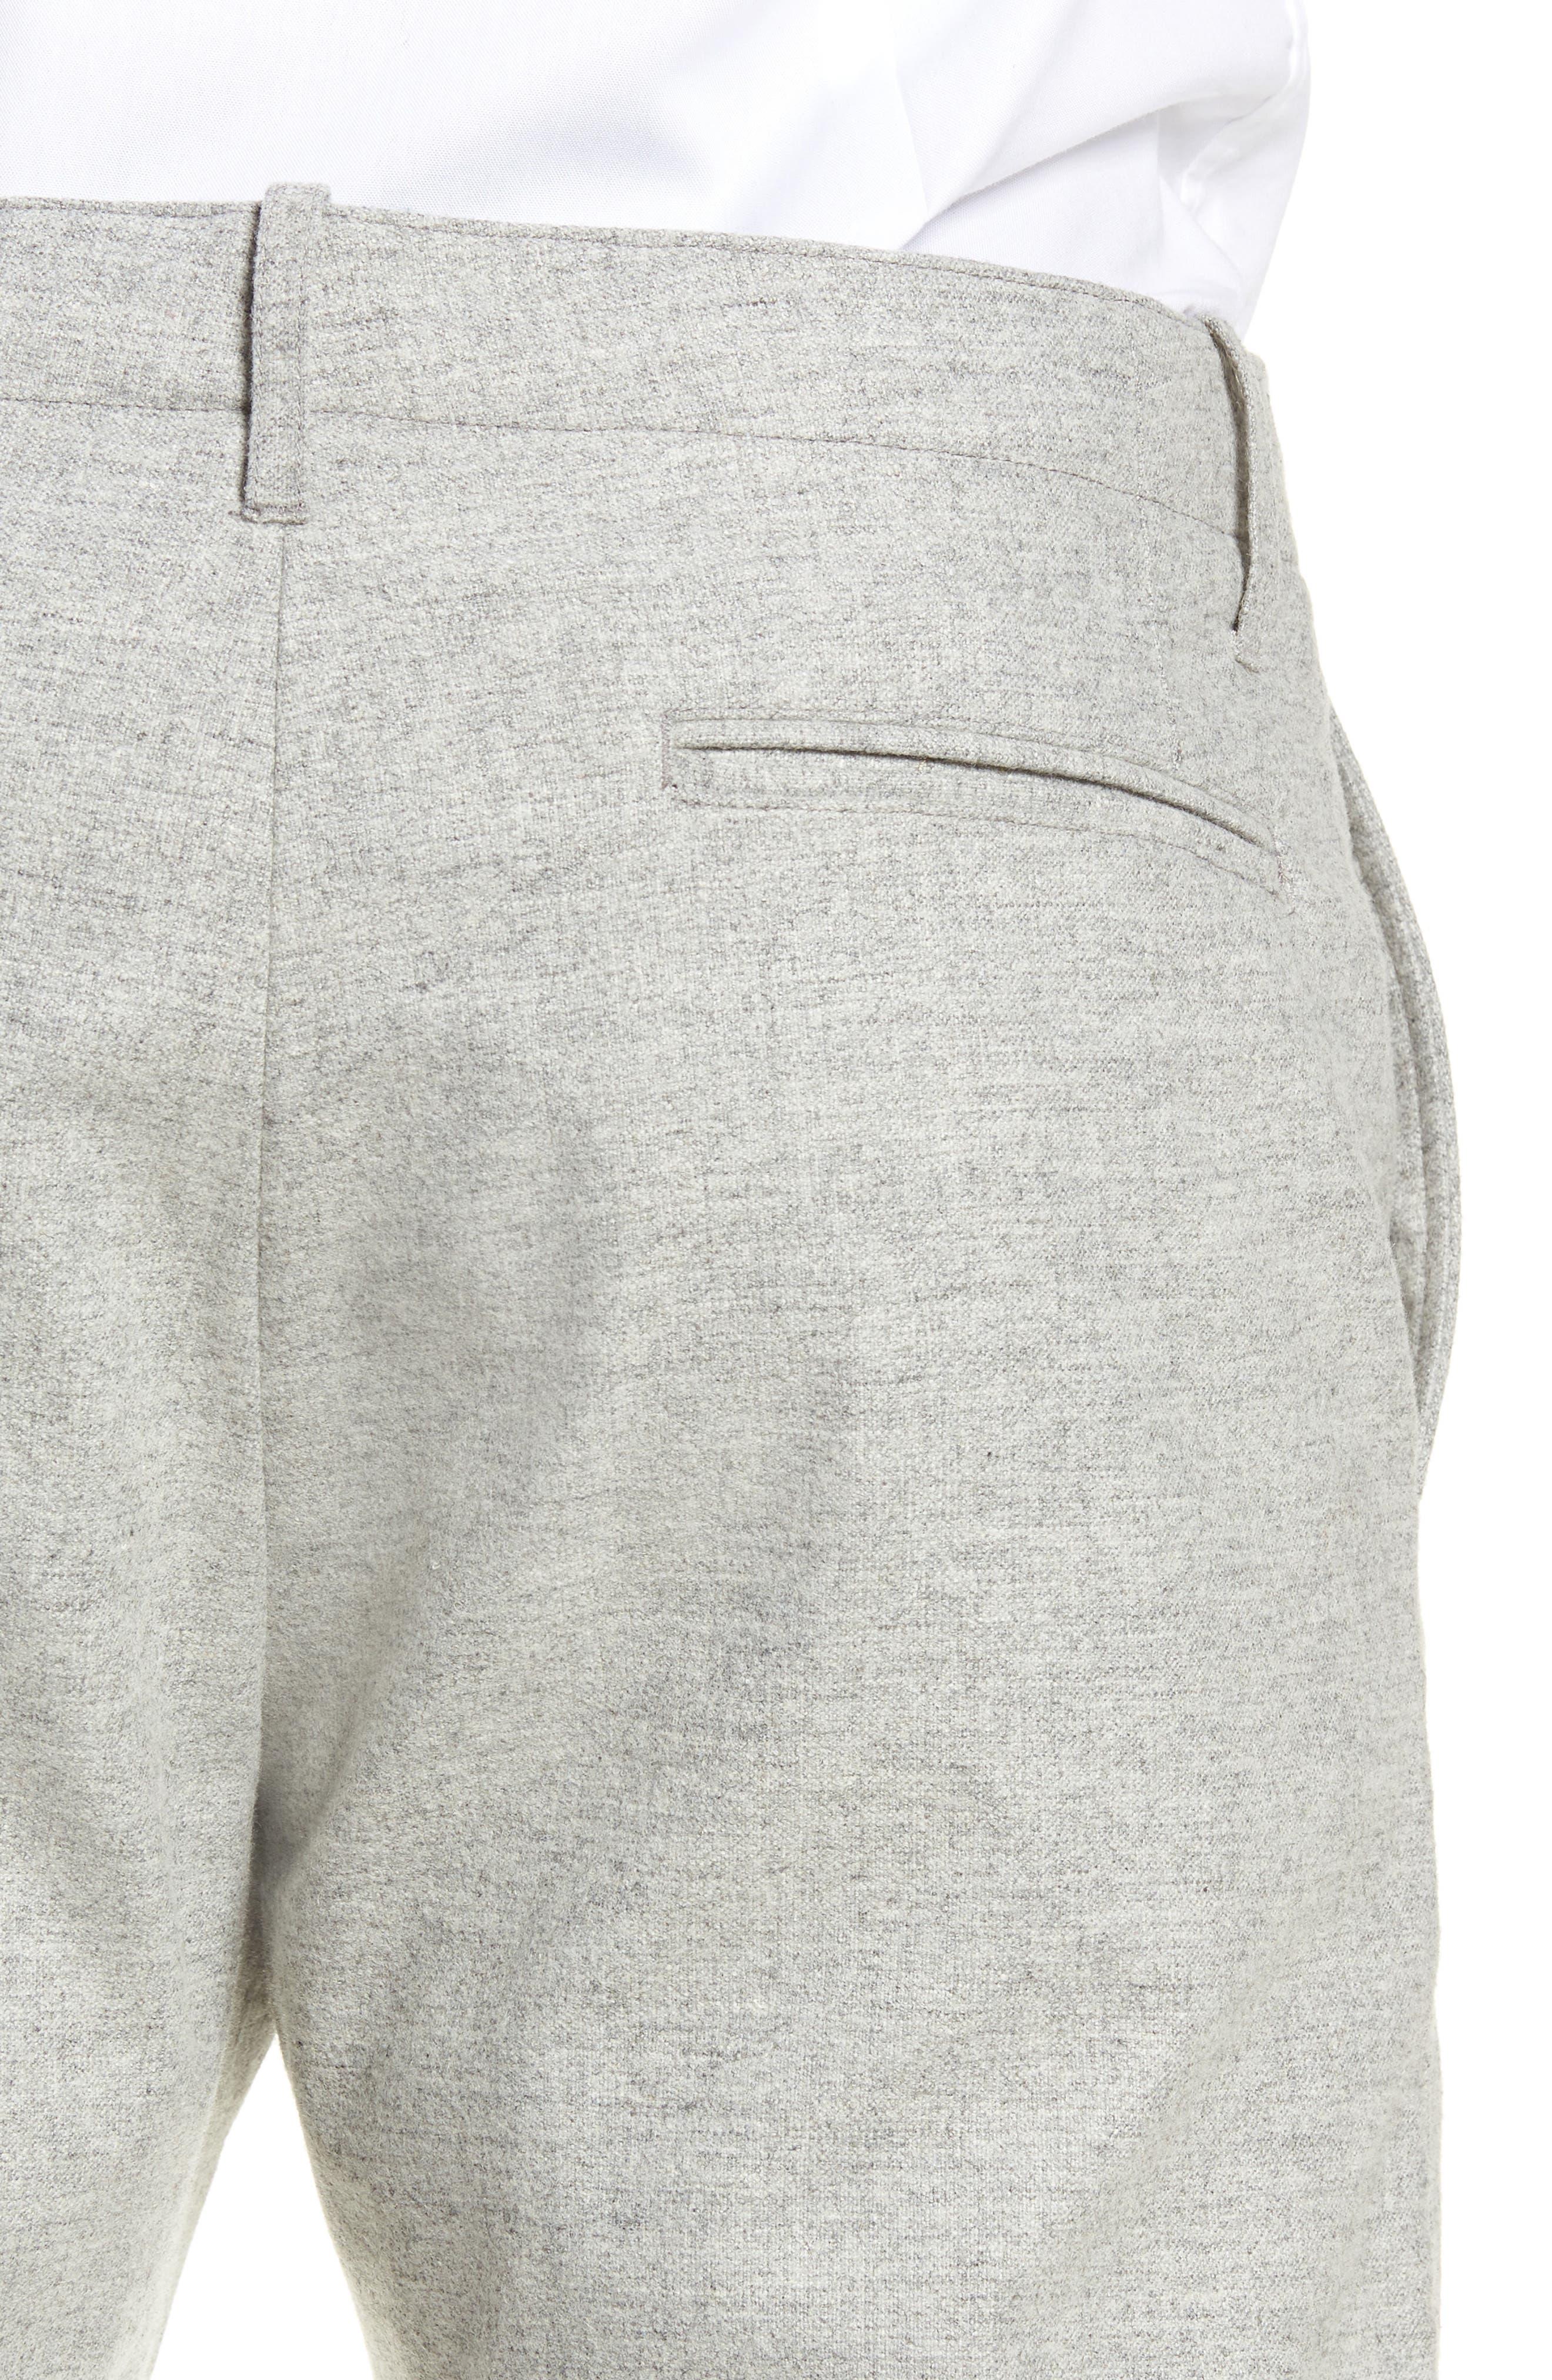 DJVU Slim Fit Trousers,                             Alternate thumbnail 4, color,                             027